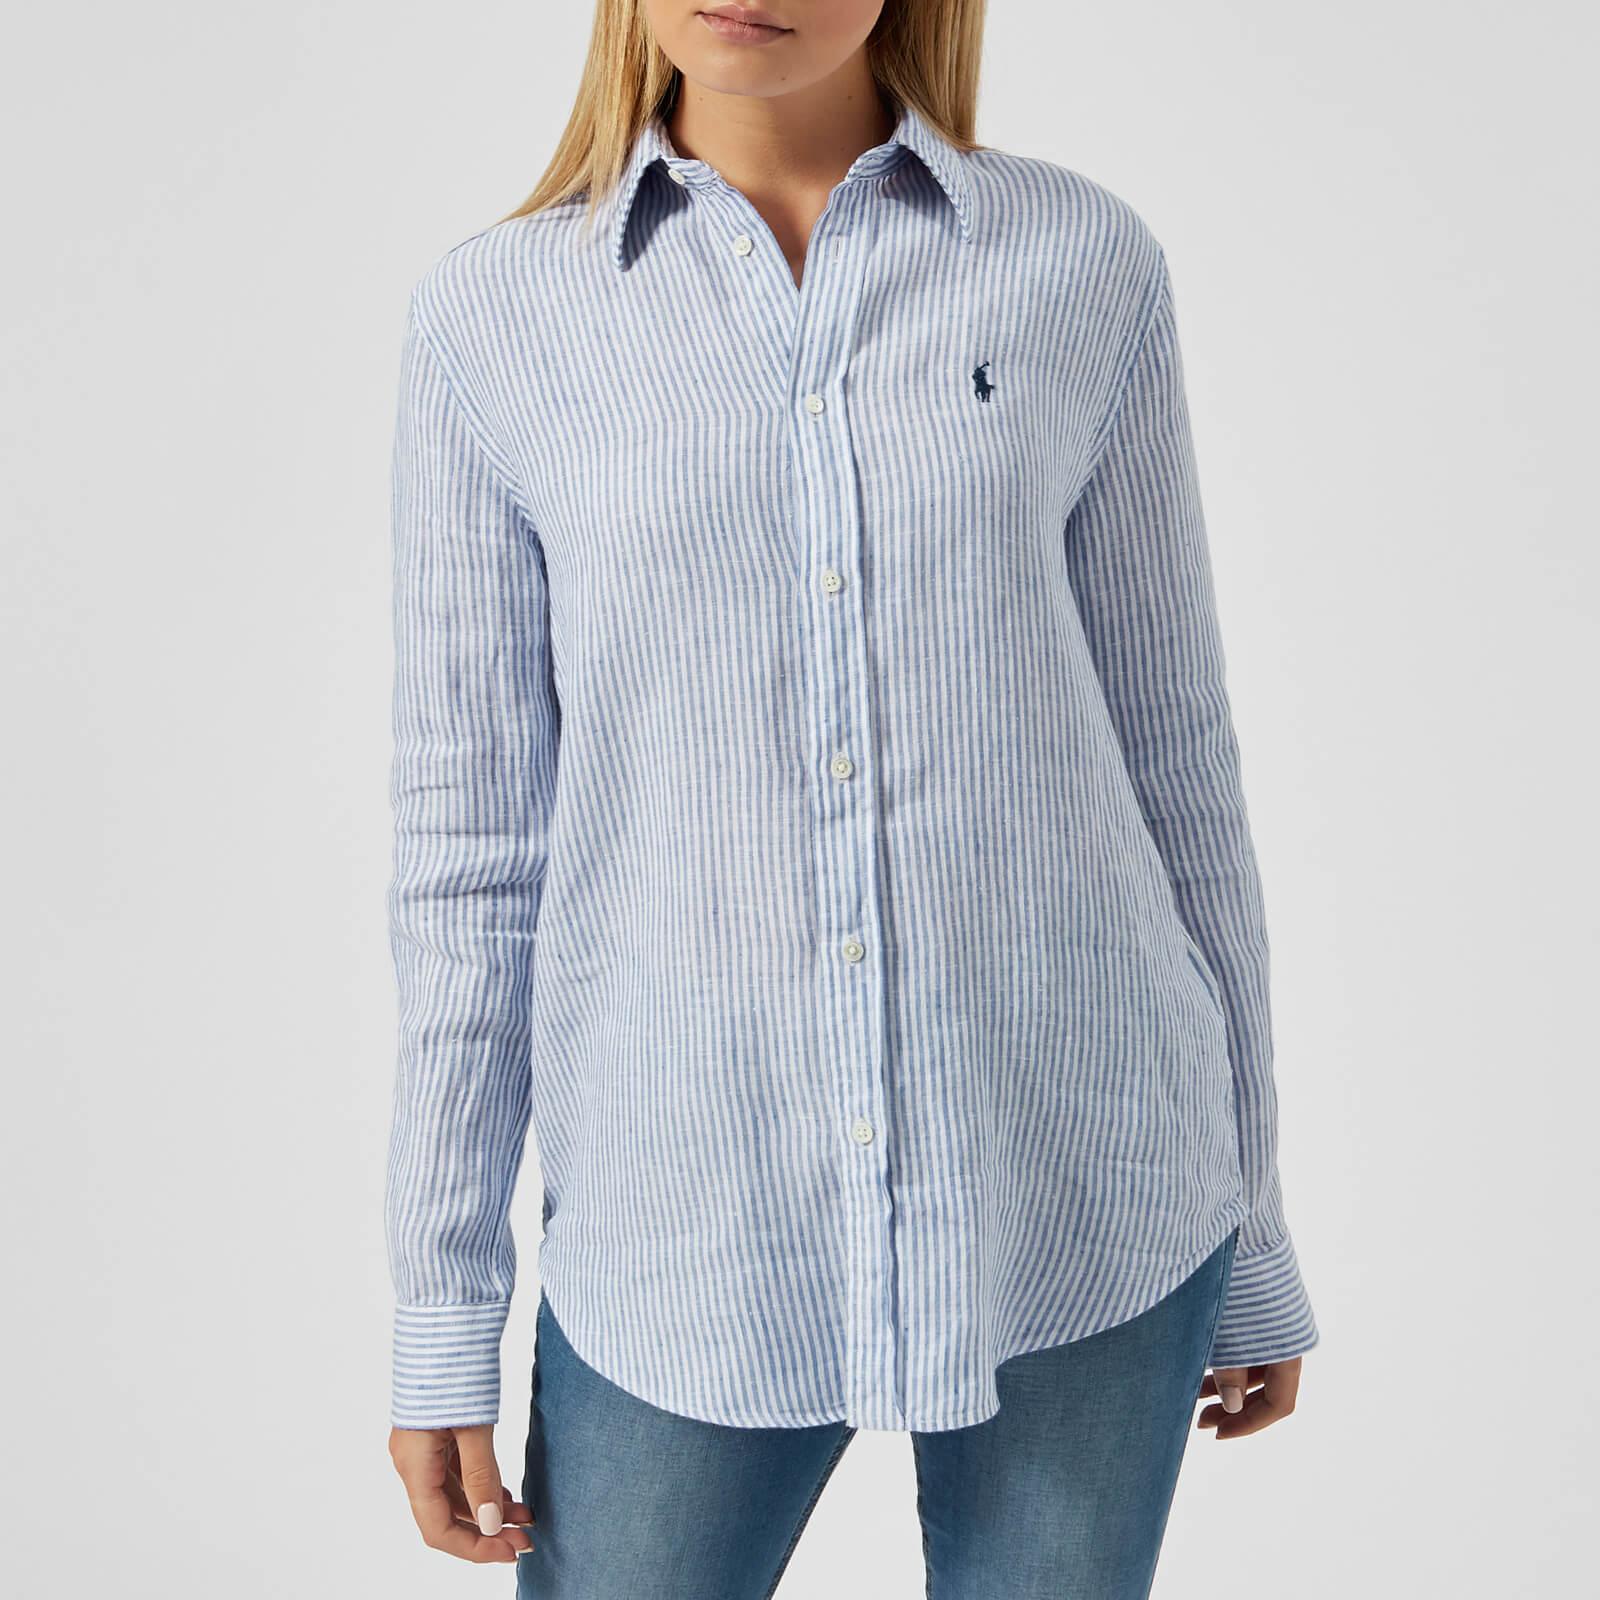 2327f1a4027e Polo Ralph Lauren Women s Logo Striped Linen Shirt - Blue White - Free UK  Delivery over £50